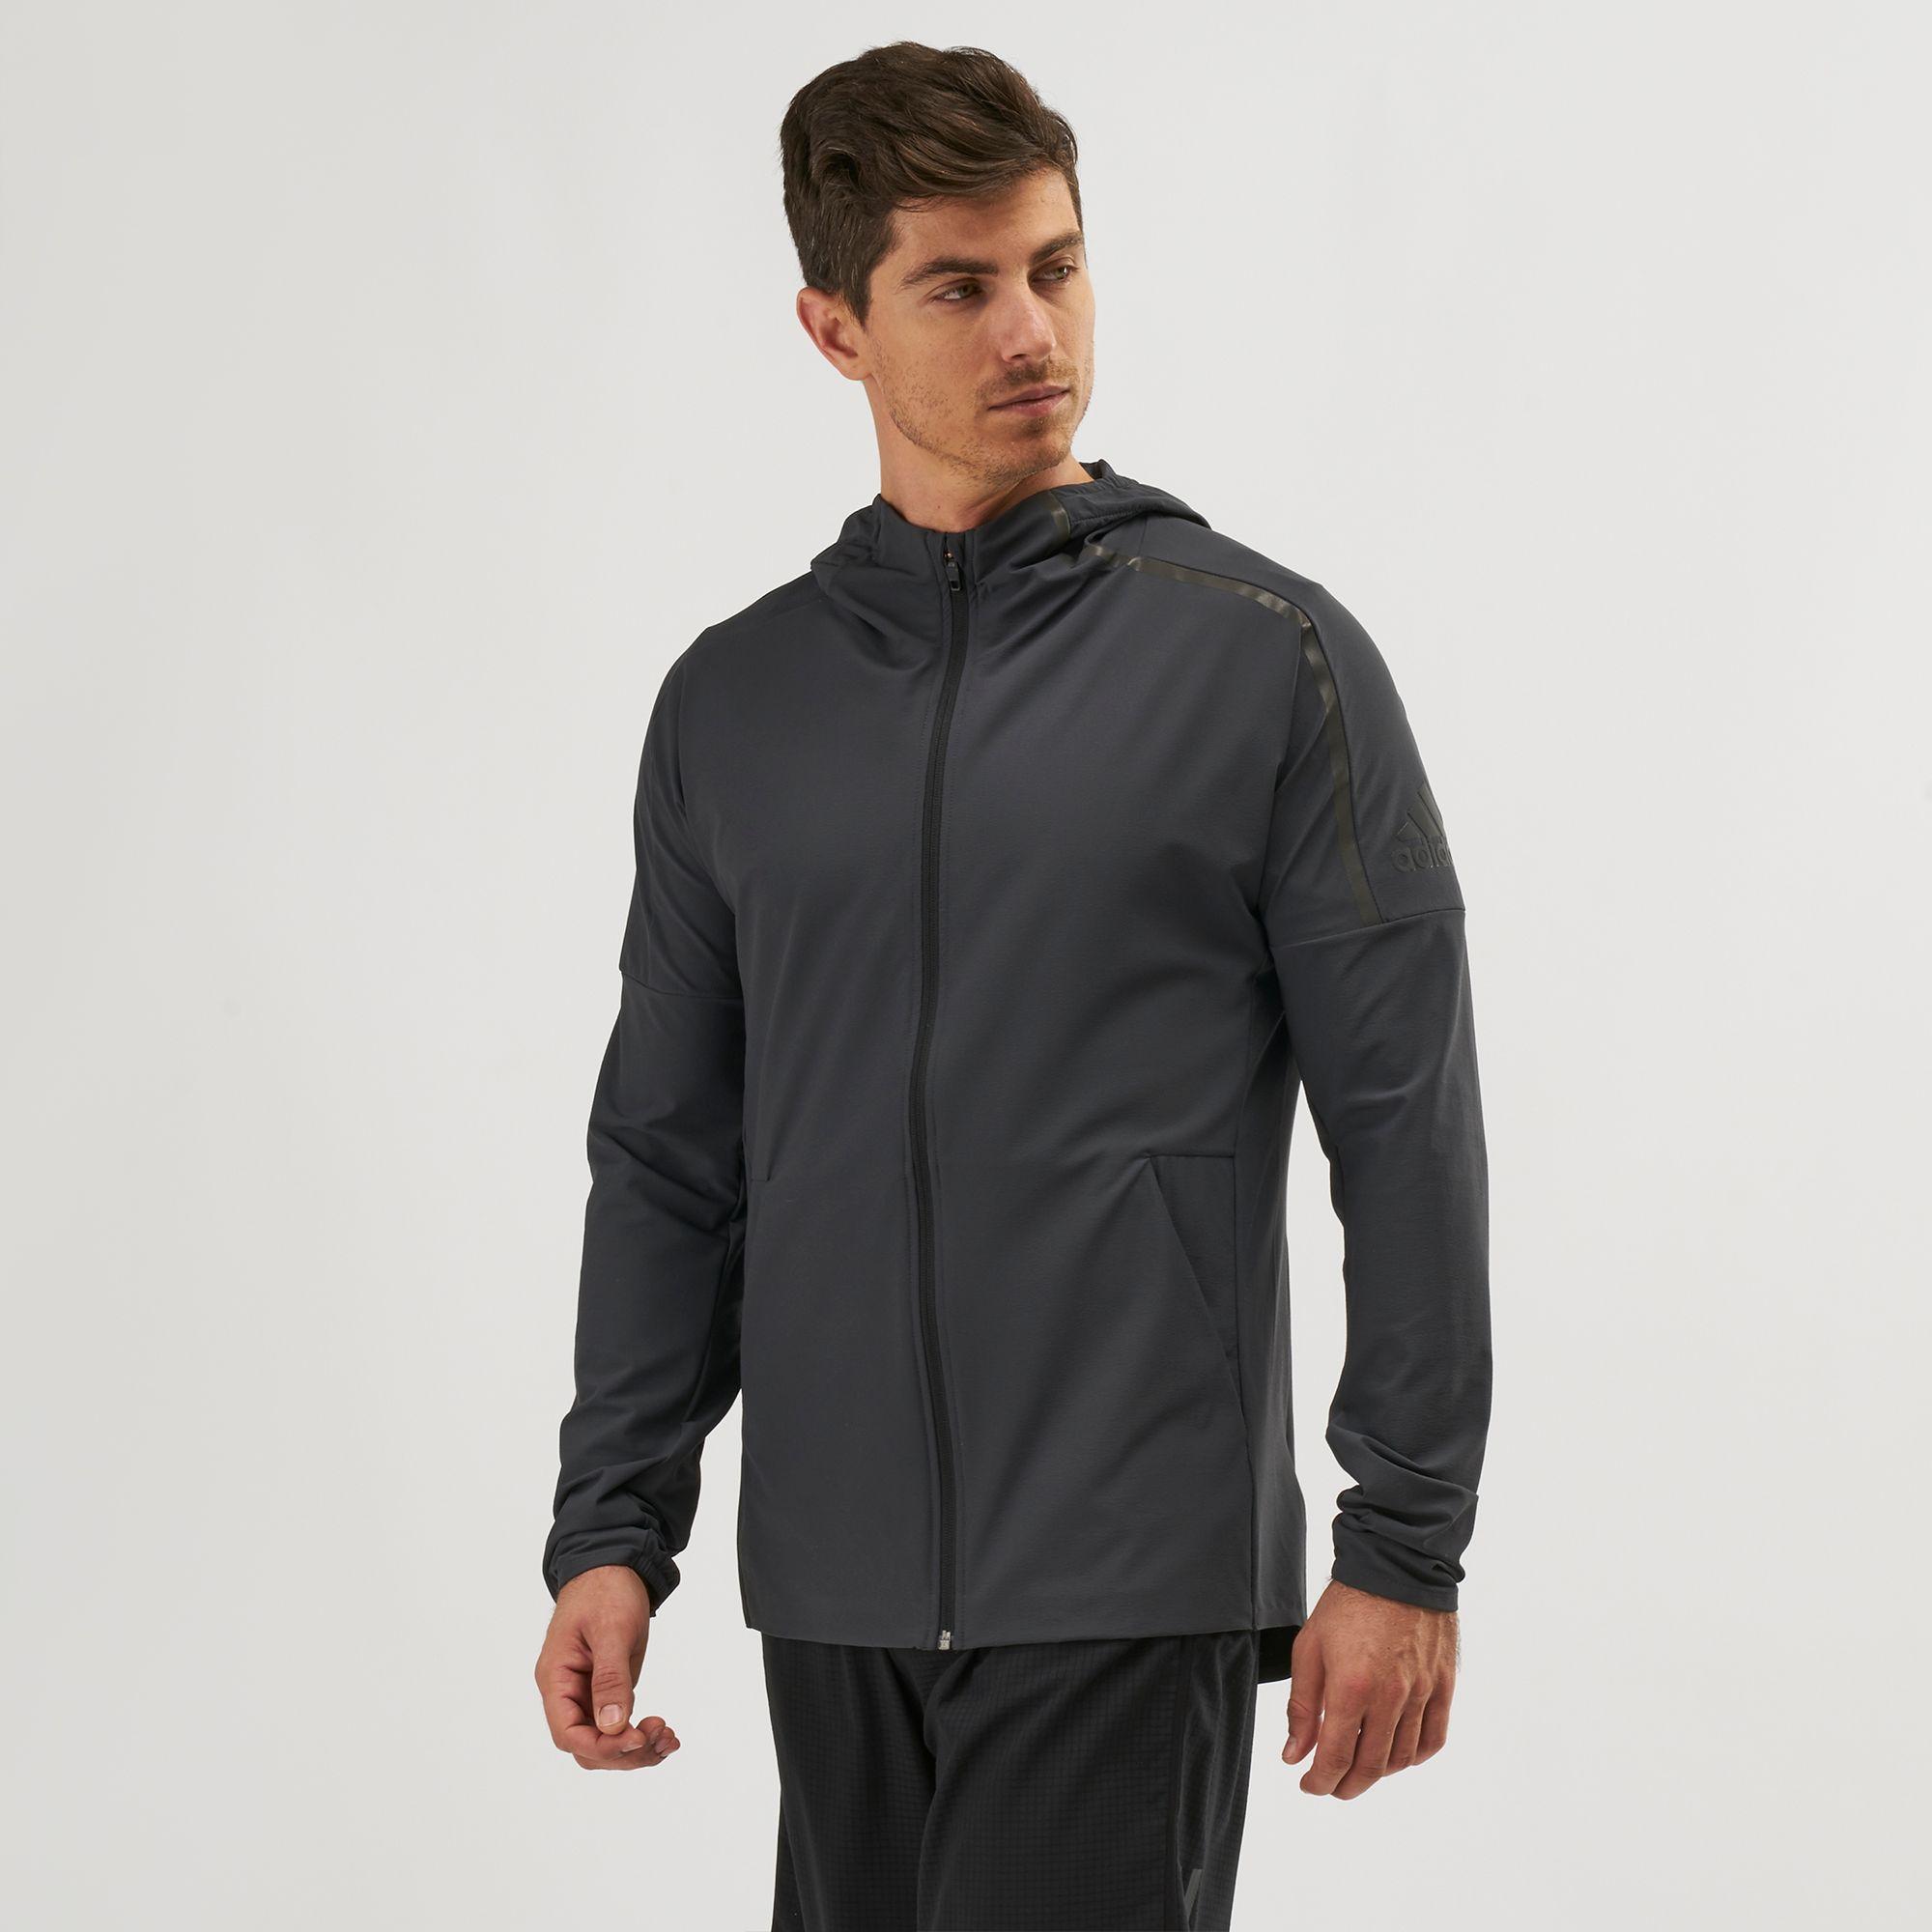 adidas Z.N.E. Run Jacket Women